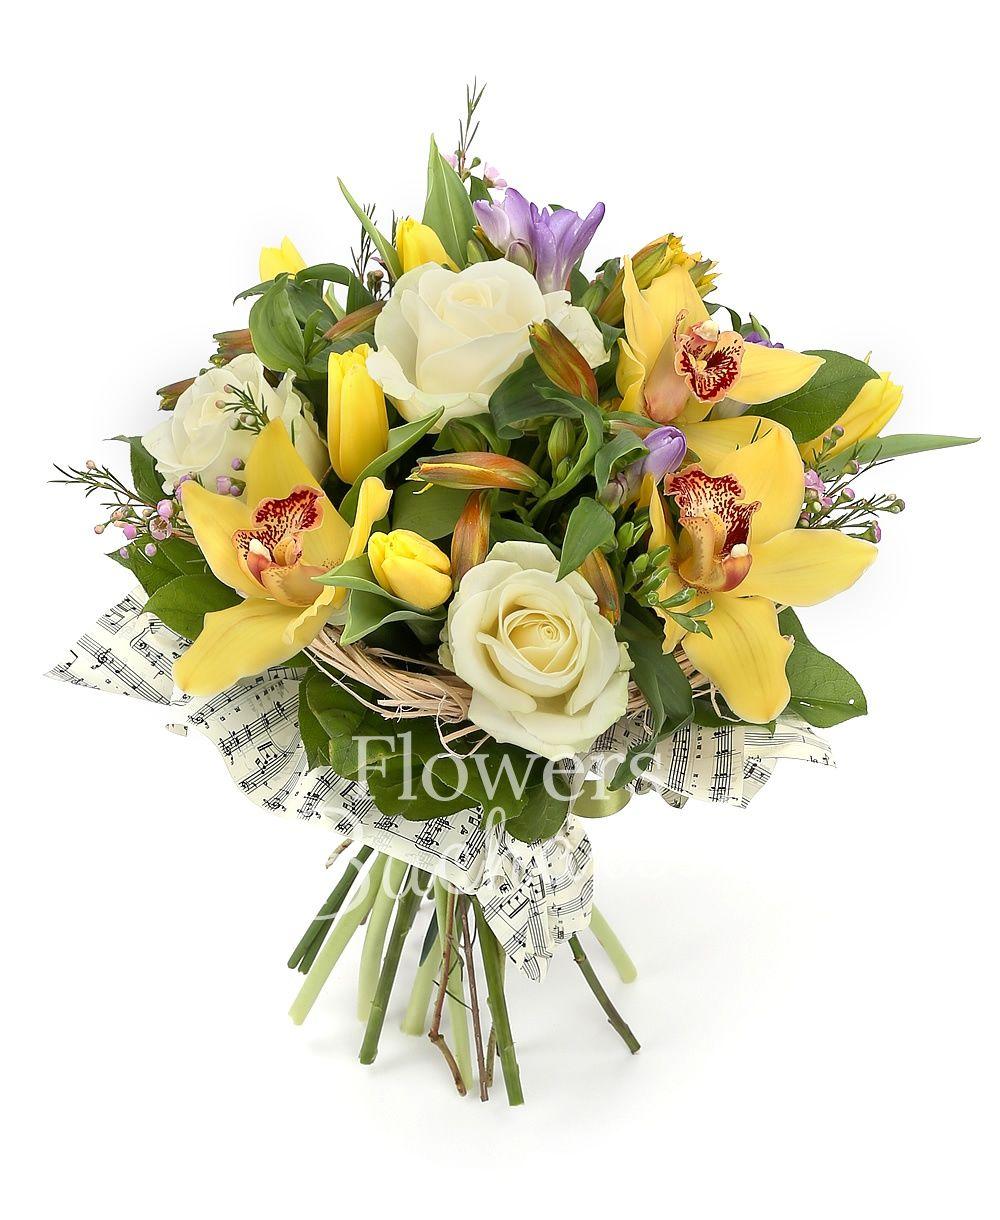 3 white roses, 5 yellow alstroemerias, 5 purple freesias, 5 yellow tulips, greenery